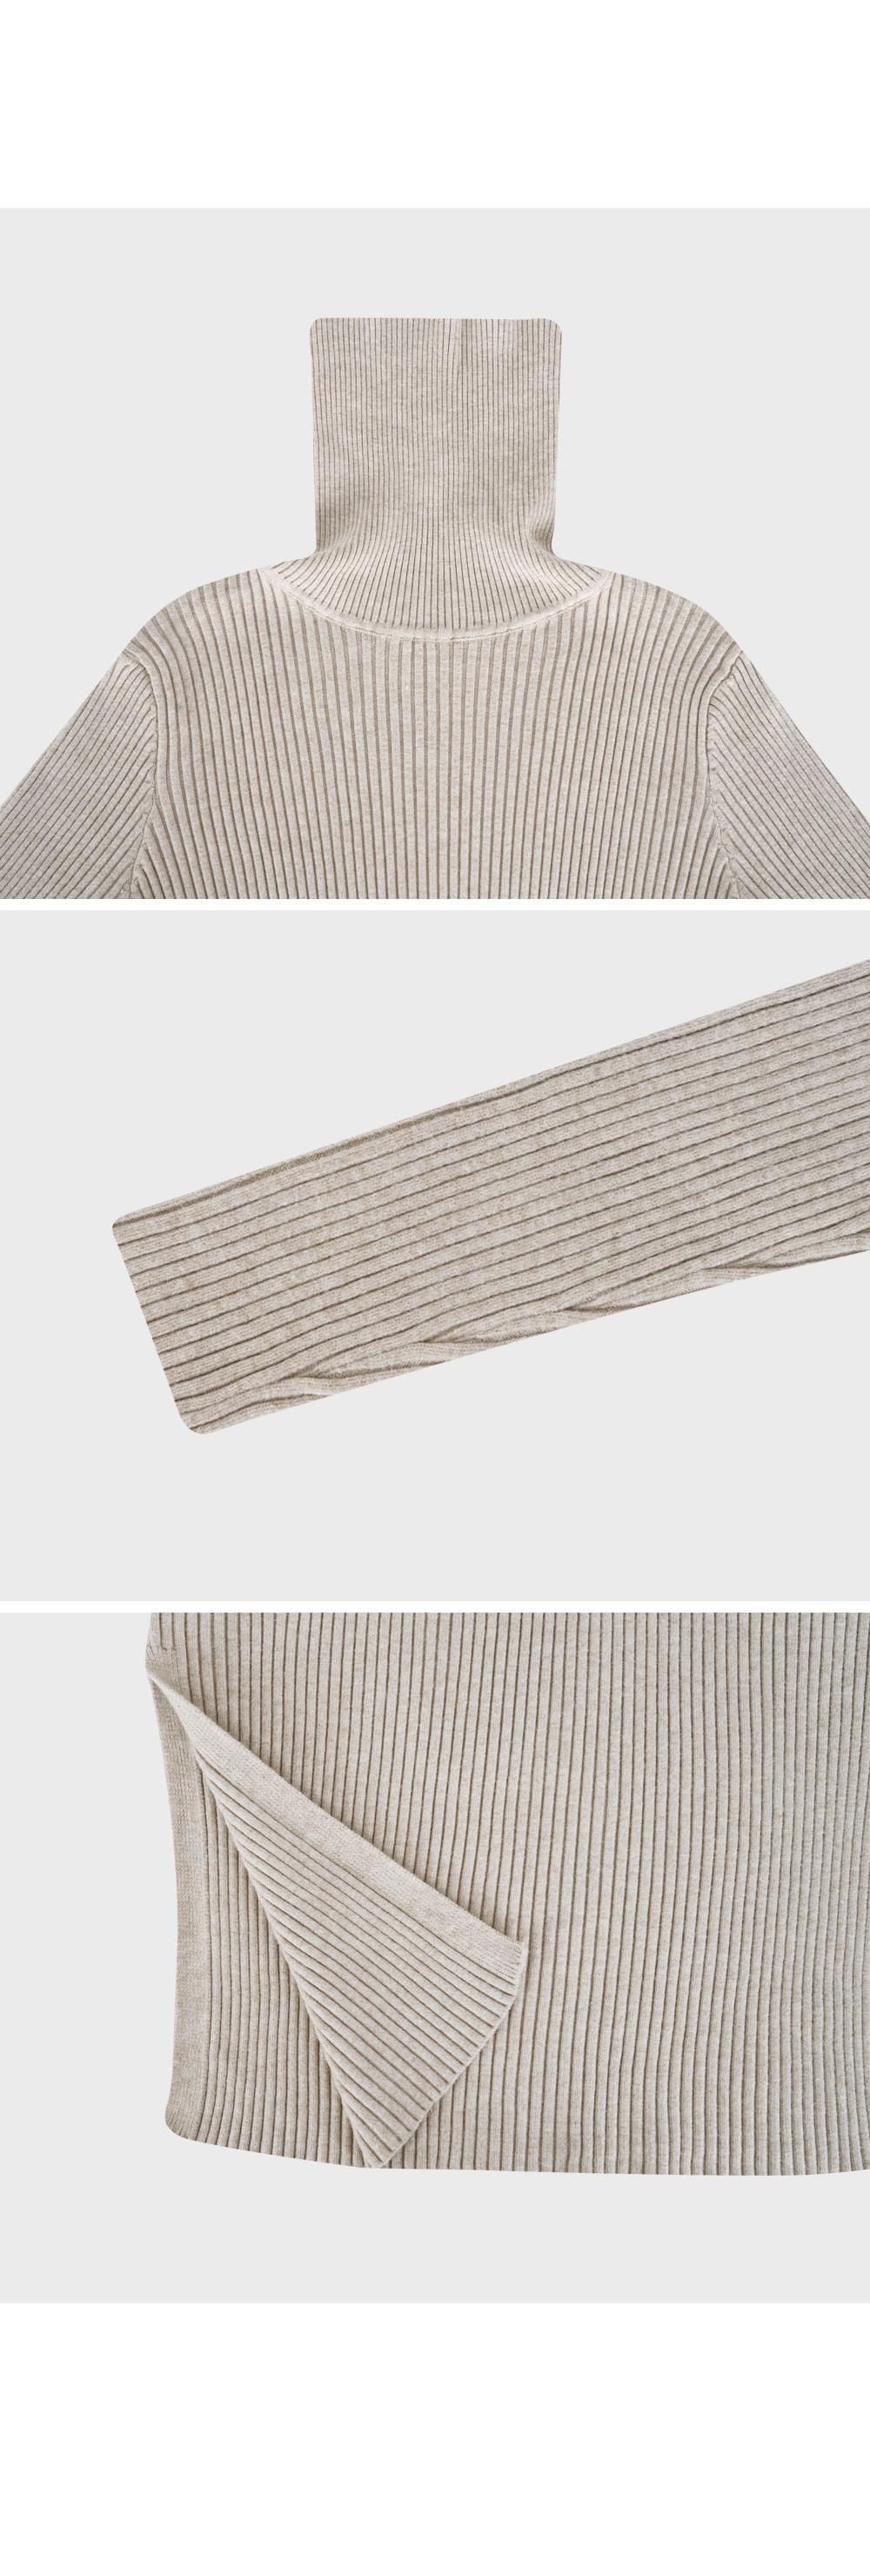 Turtleneck Wool Knit Dress-holiholic.com